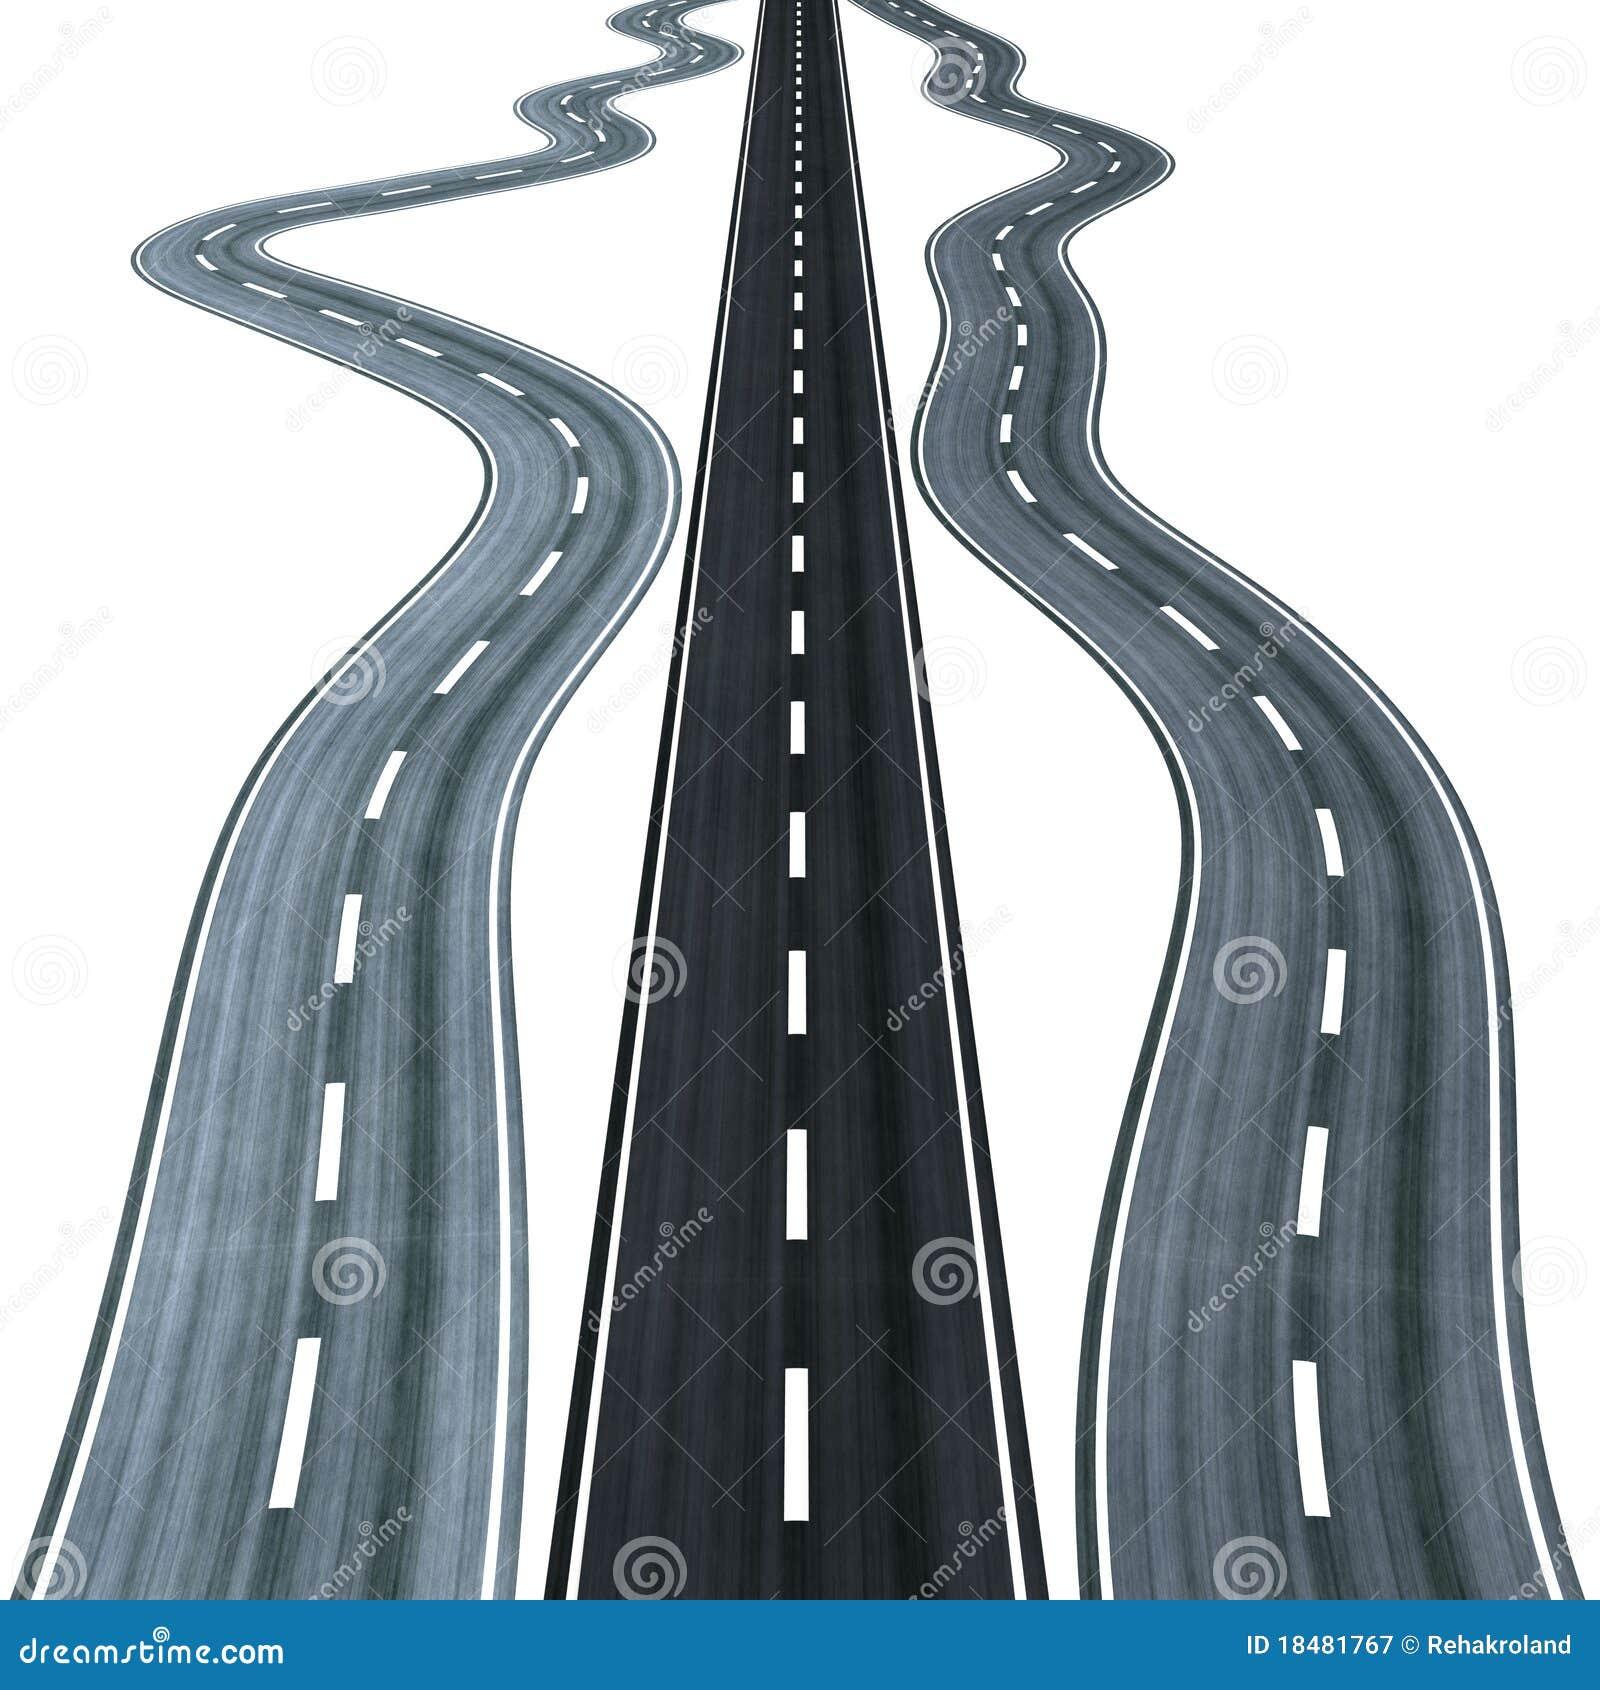 straight road among winding ones stock illustration illustration